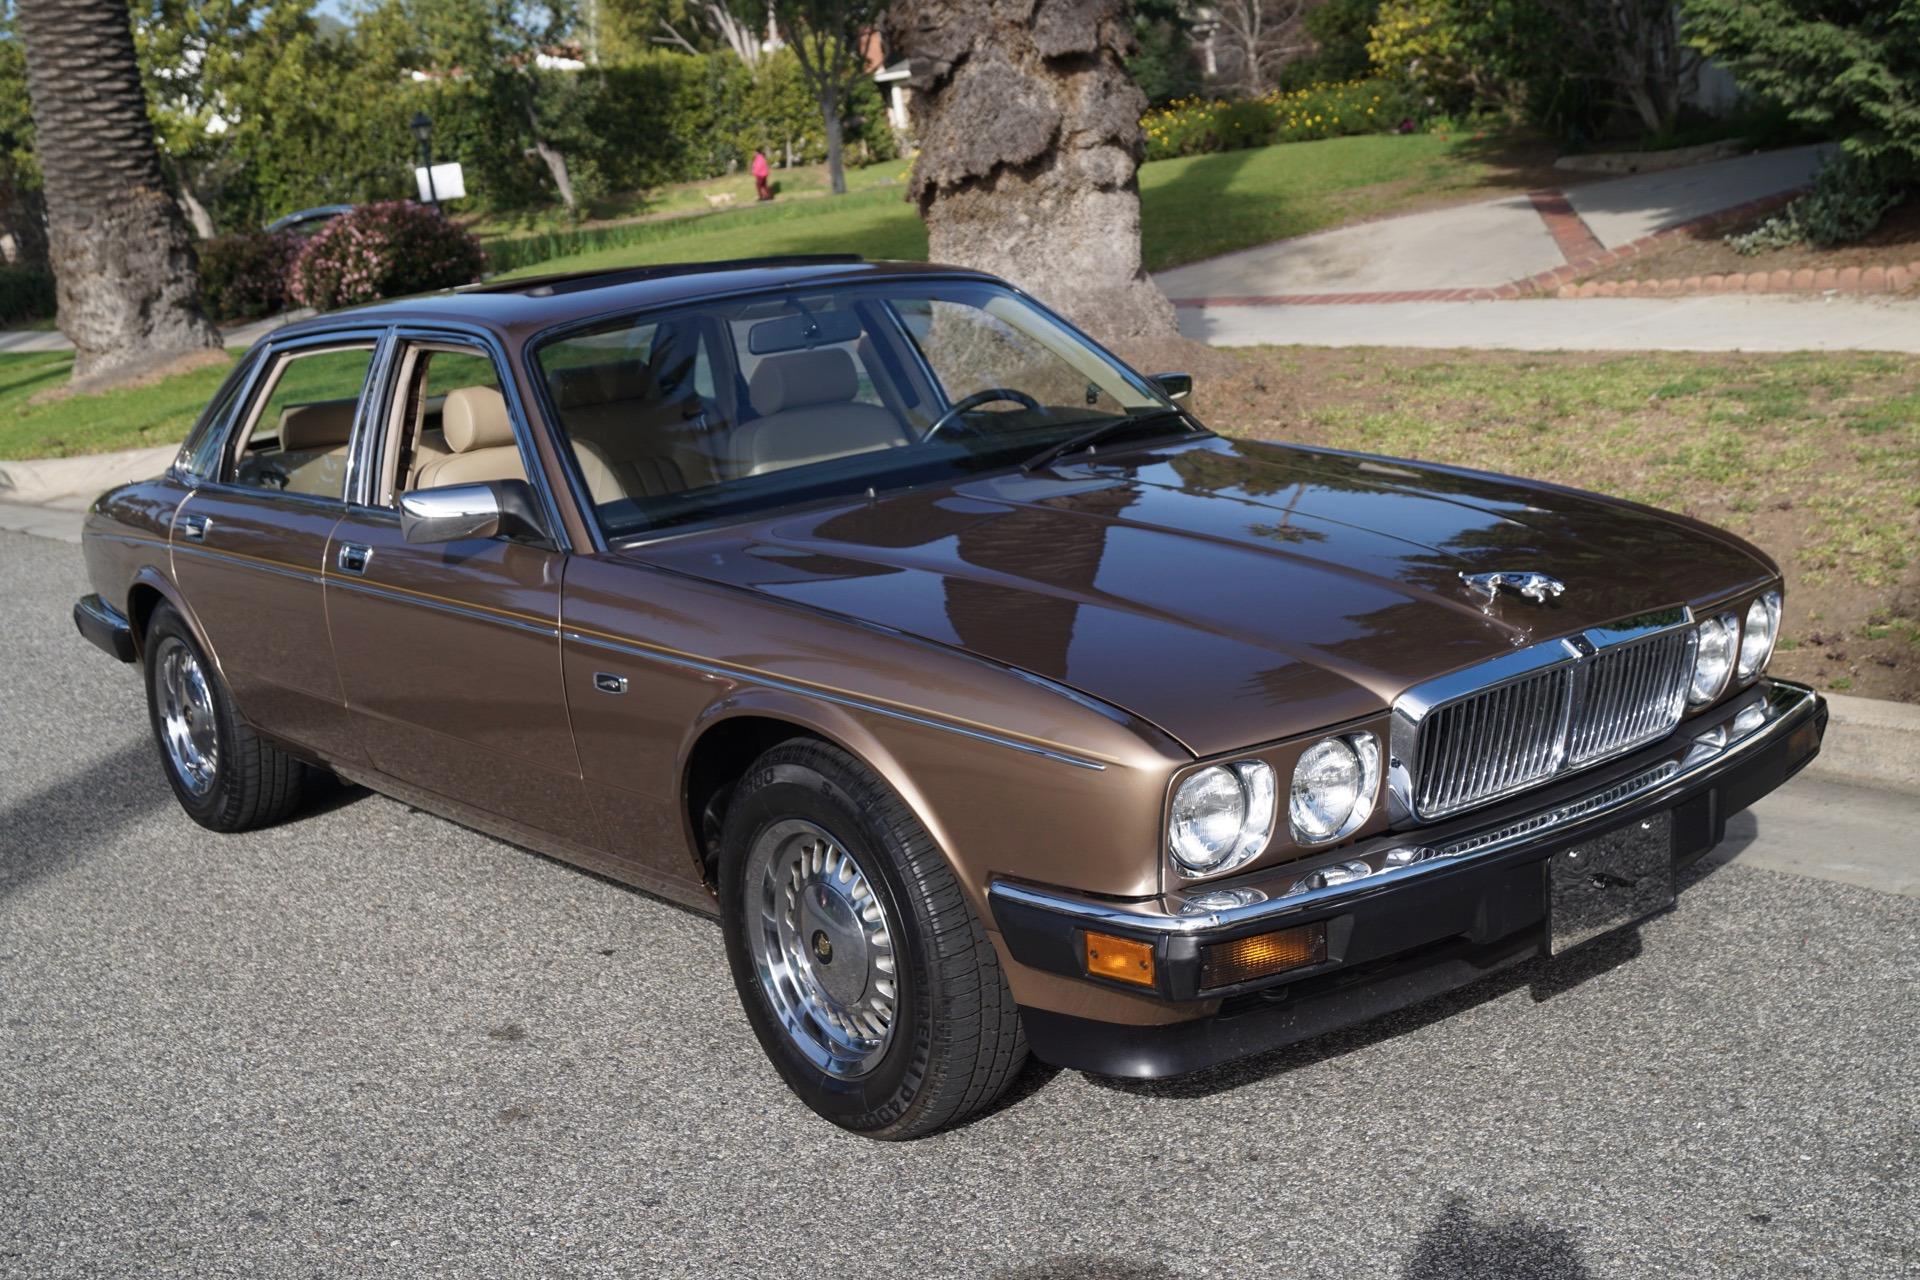 1989 jaguar xj6 vanden plas owners manual